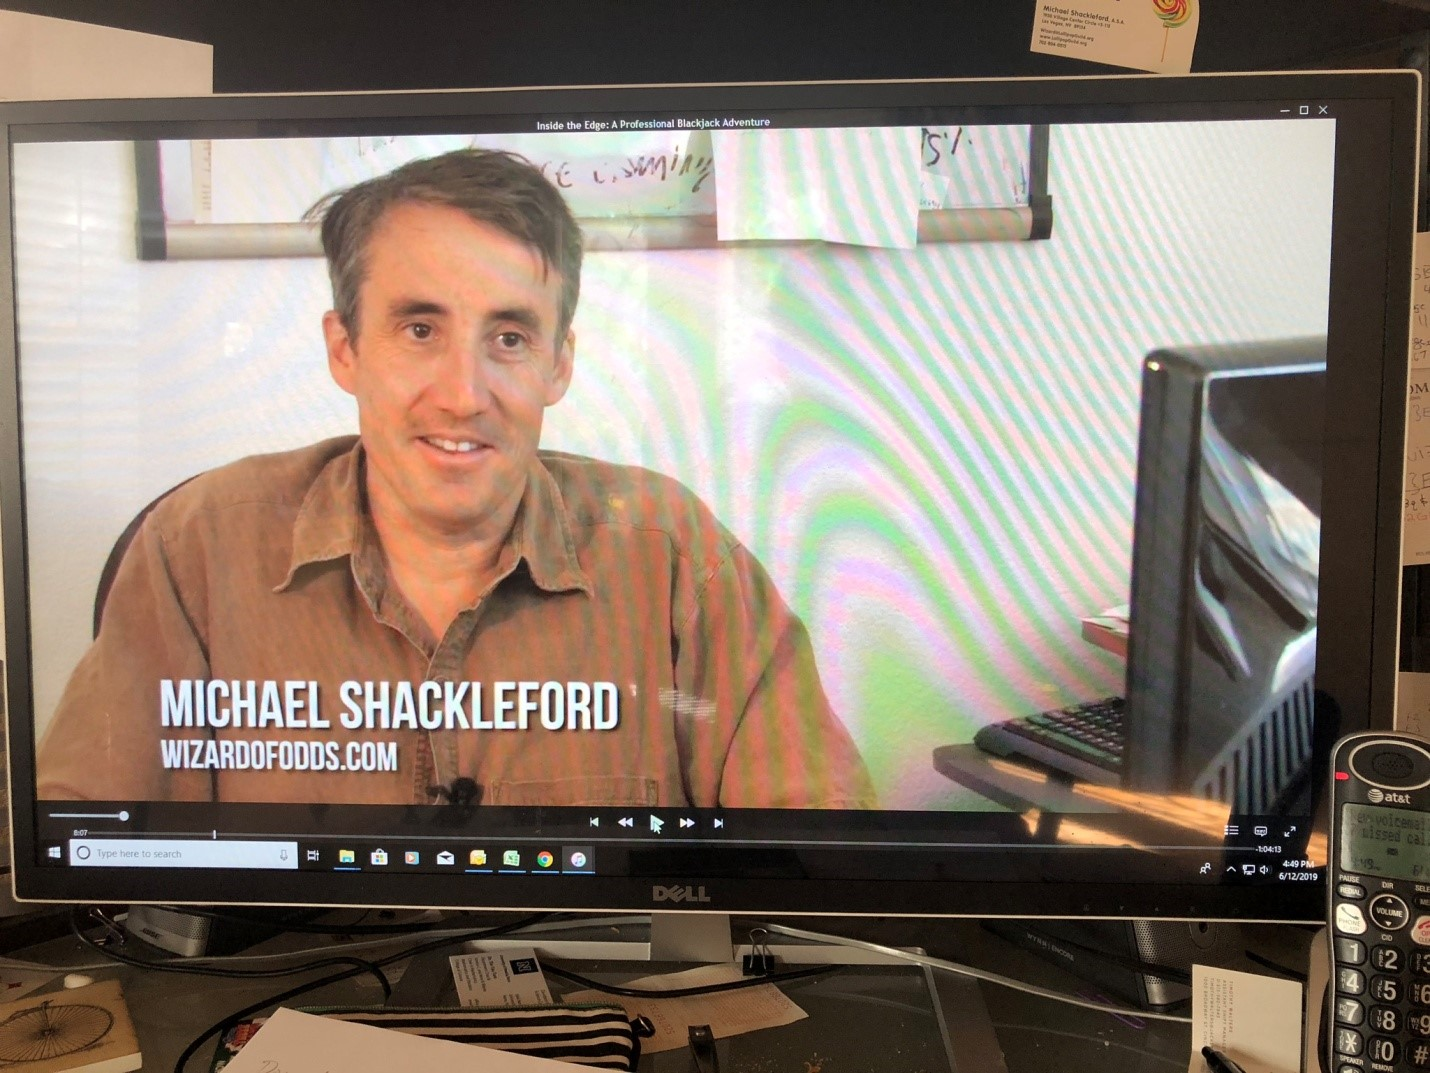 Michael Shackleford